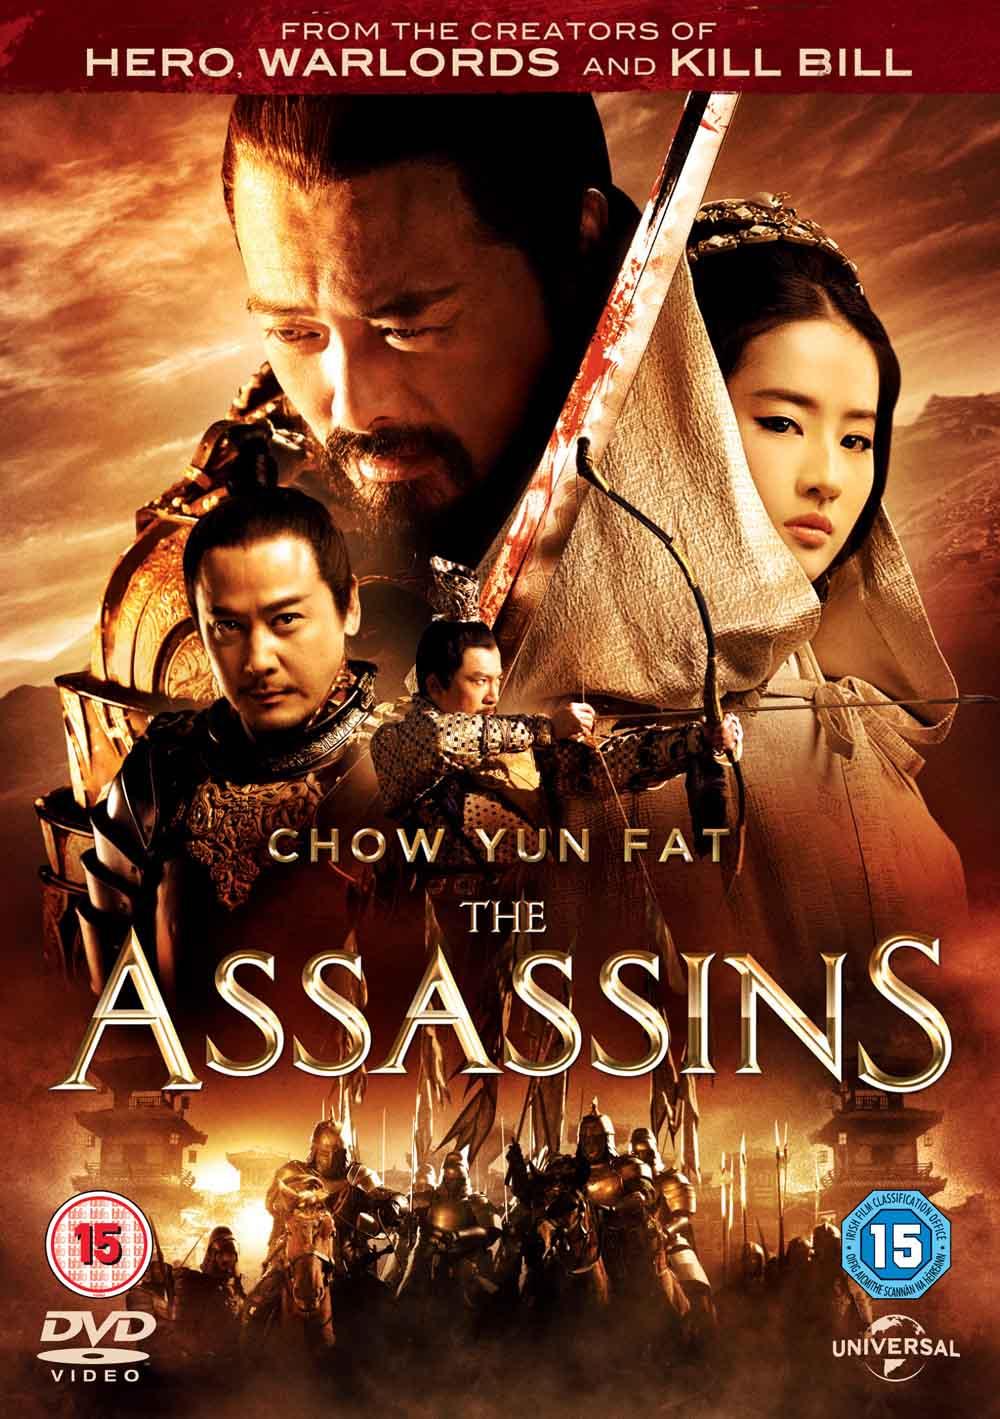 The Assassins (2012) Dual Audio Hindi 480p BluRay 400MB Watch Online